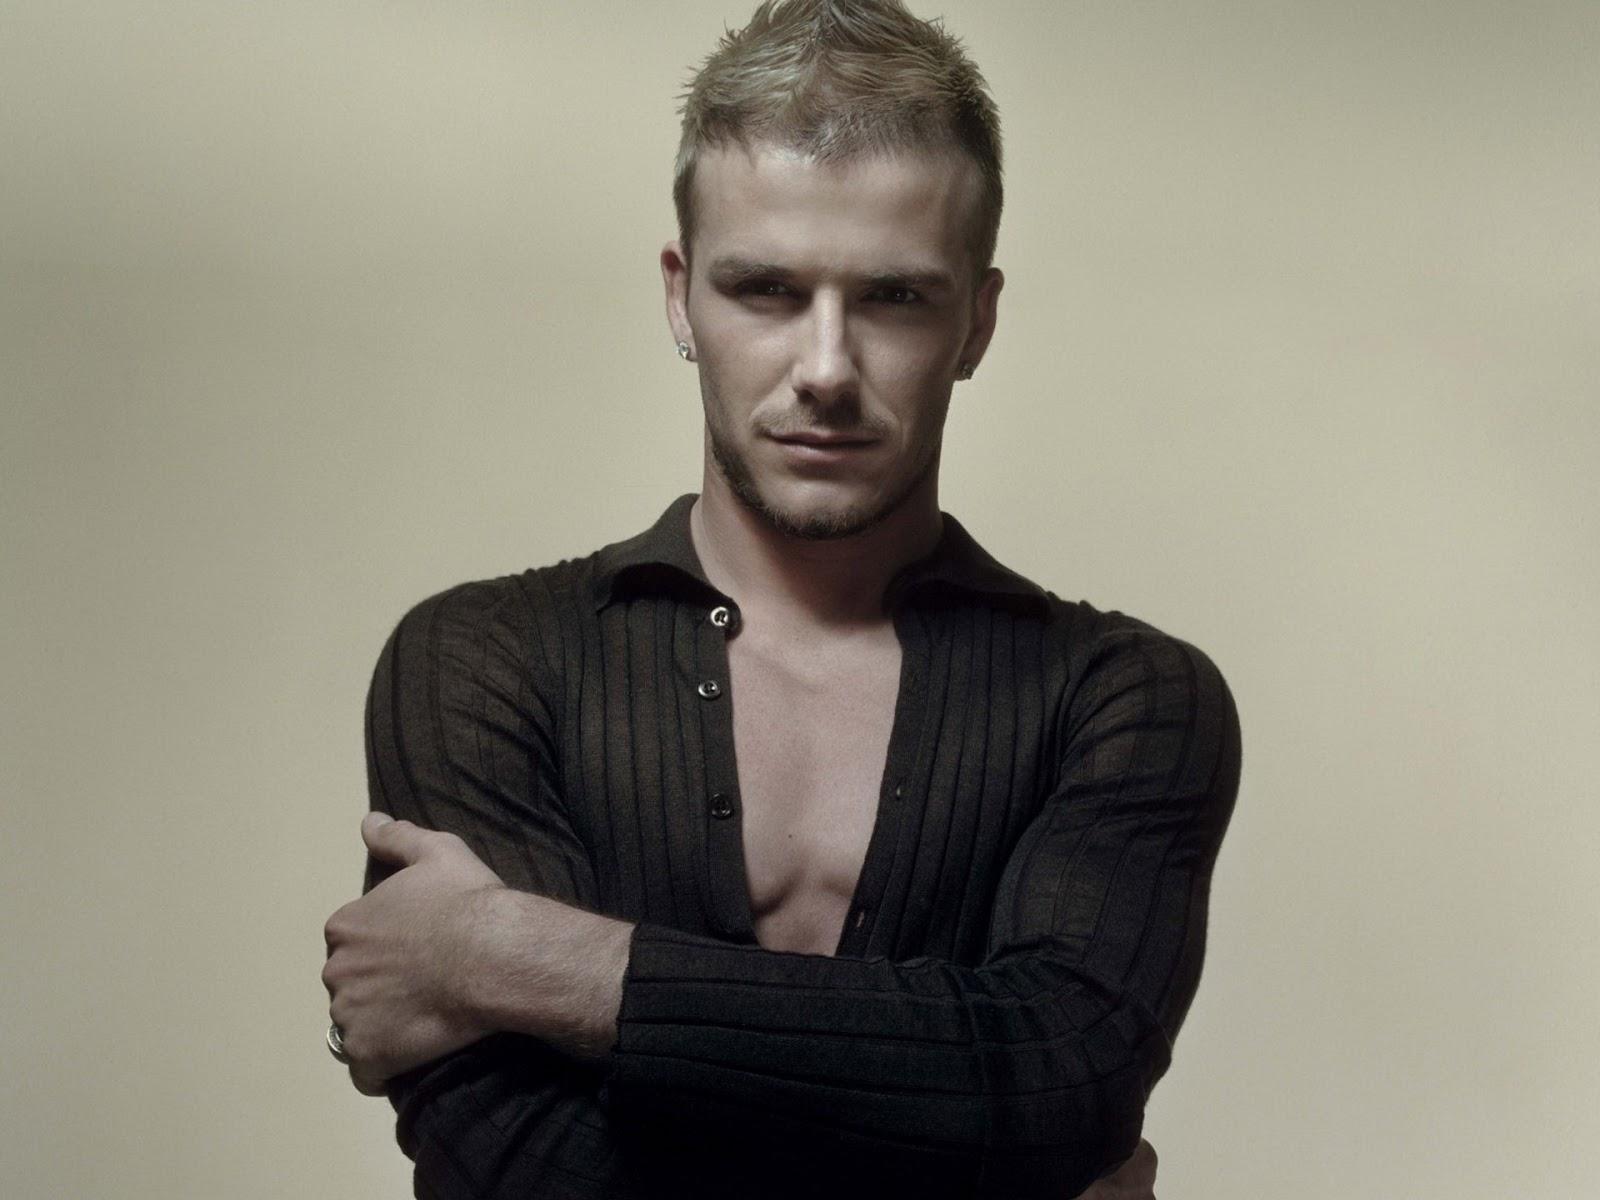 David Beckham Wallpapers 2012   Spirit Players 1600x1200